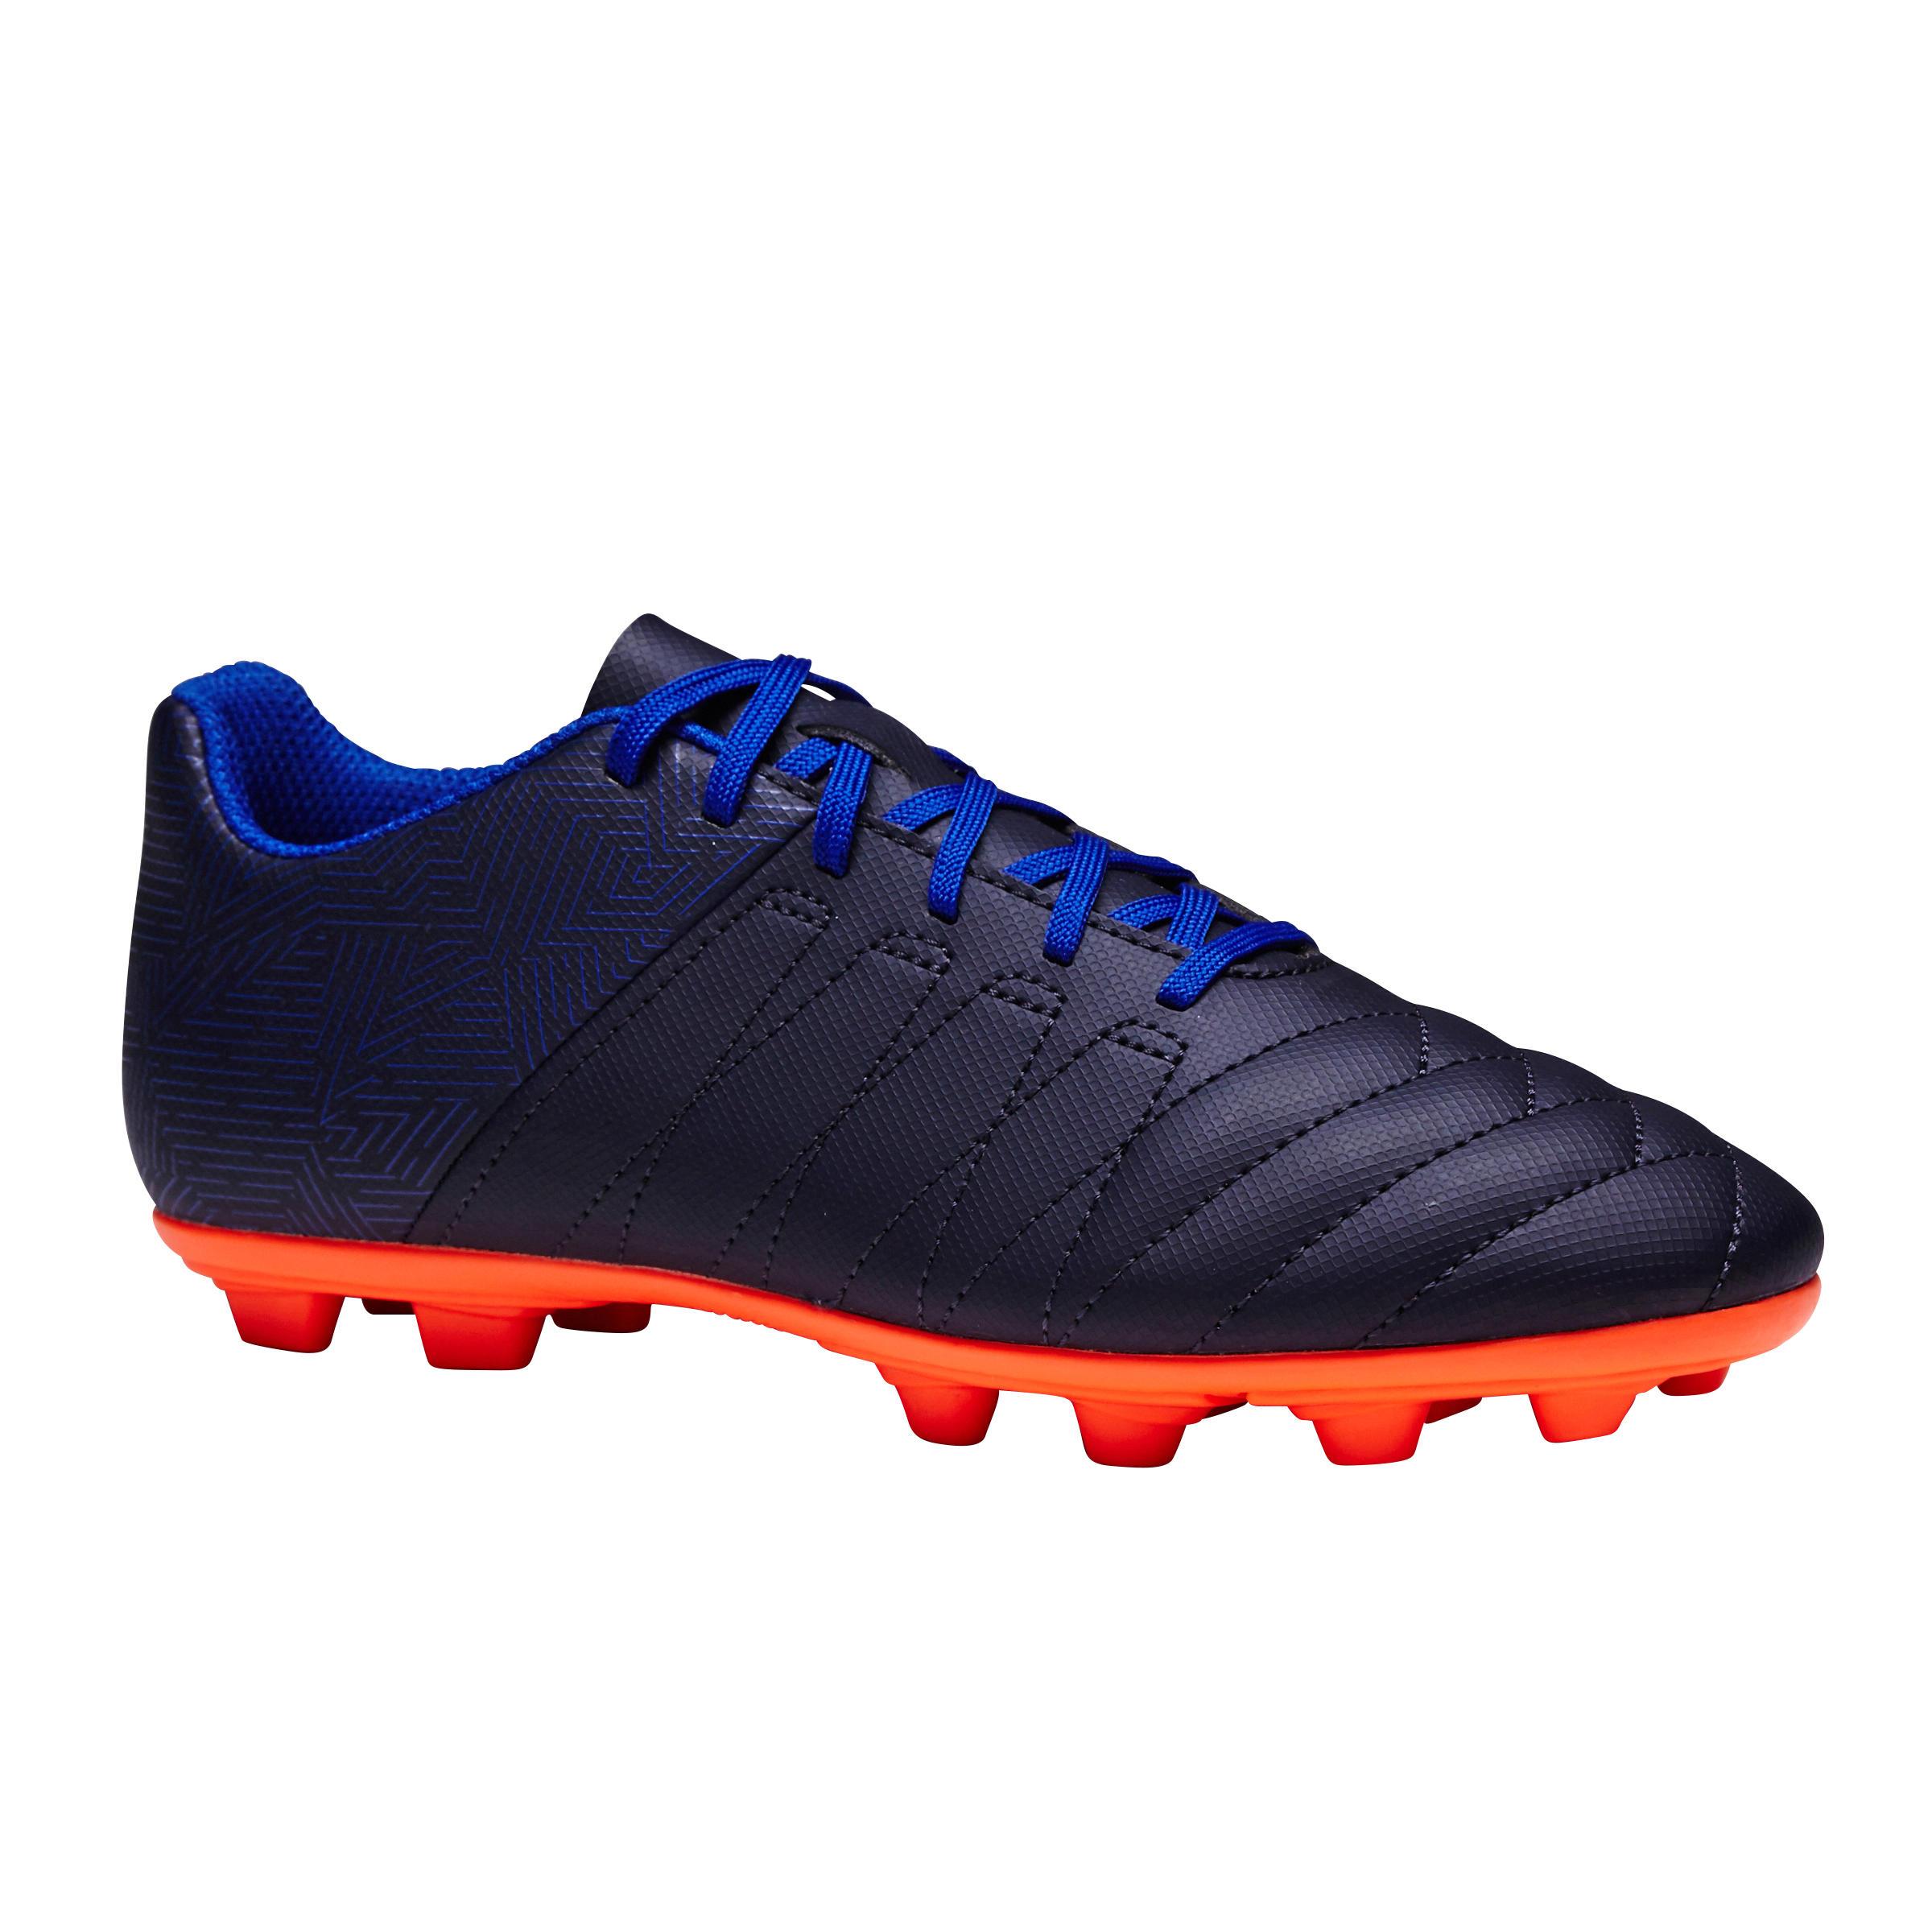 Kipsta Voetbalschoenen kind Agility 300 FG blauw/oranje